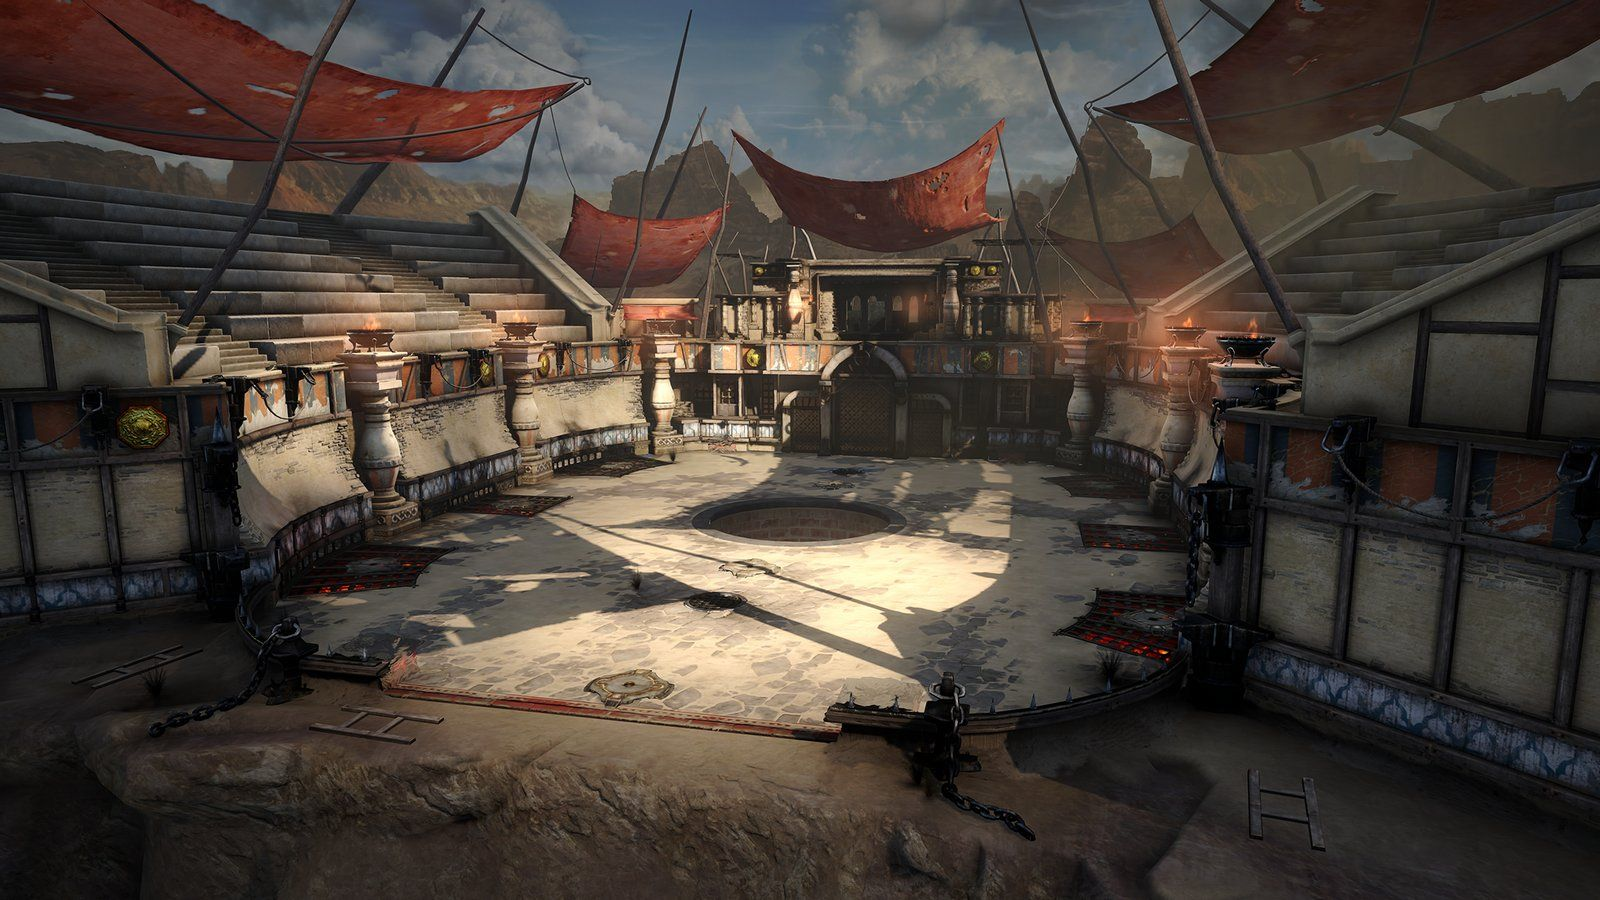 God Of War Ascension Persia Arena Shane Estanislao Cenario Anime Rpg Medieval